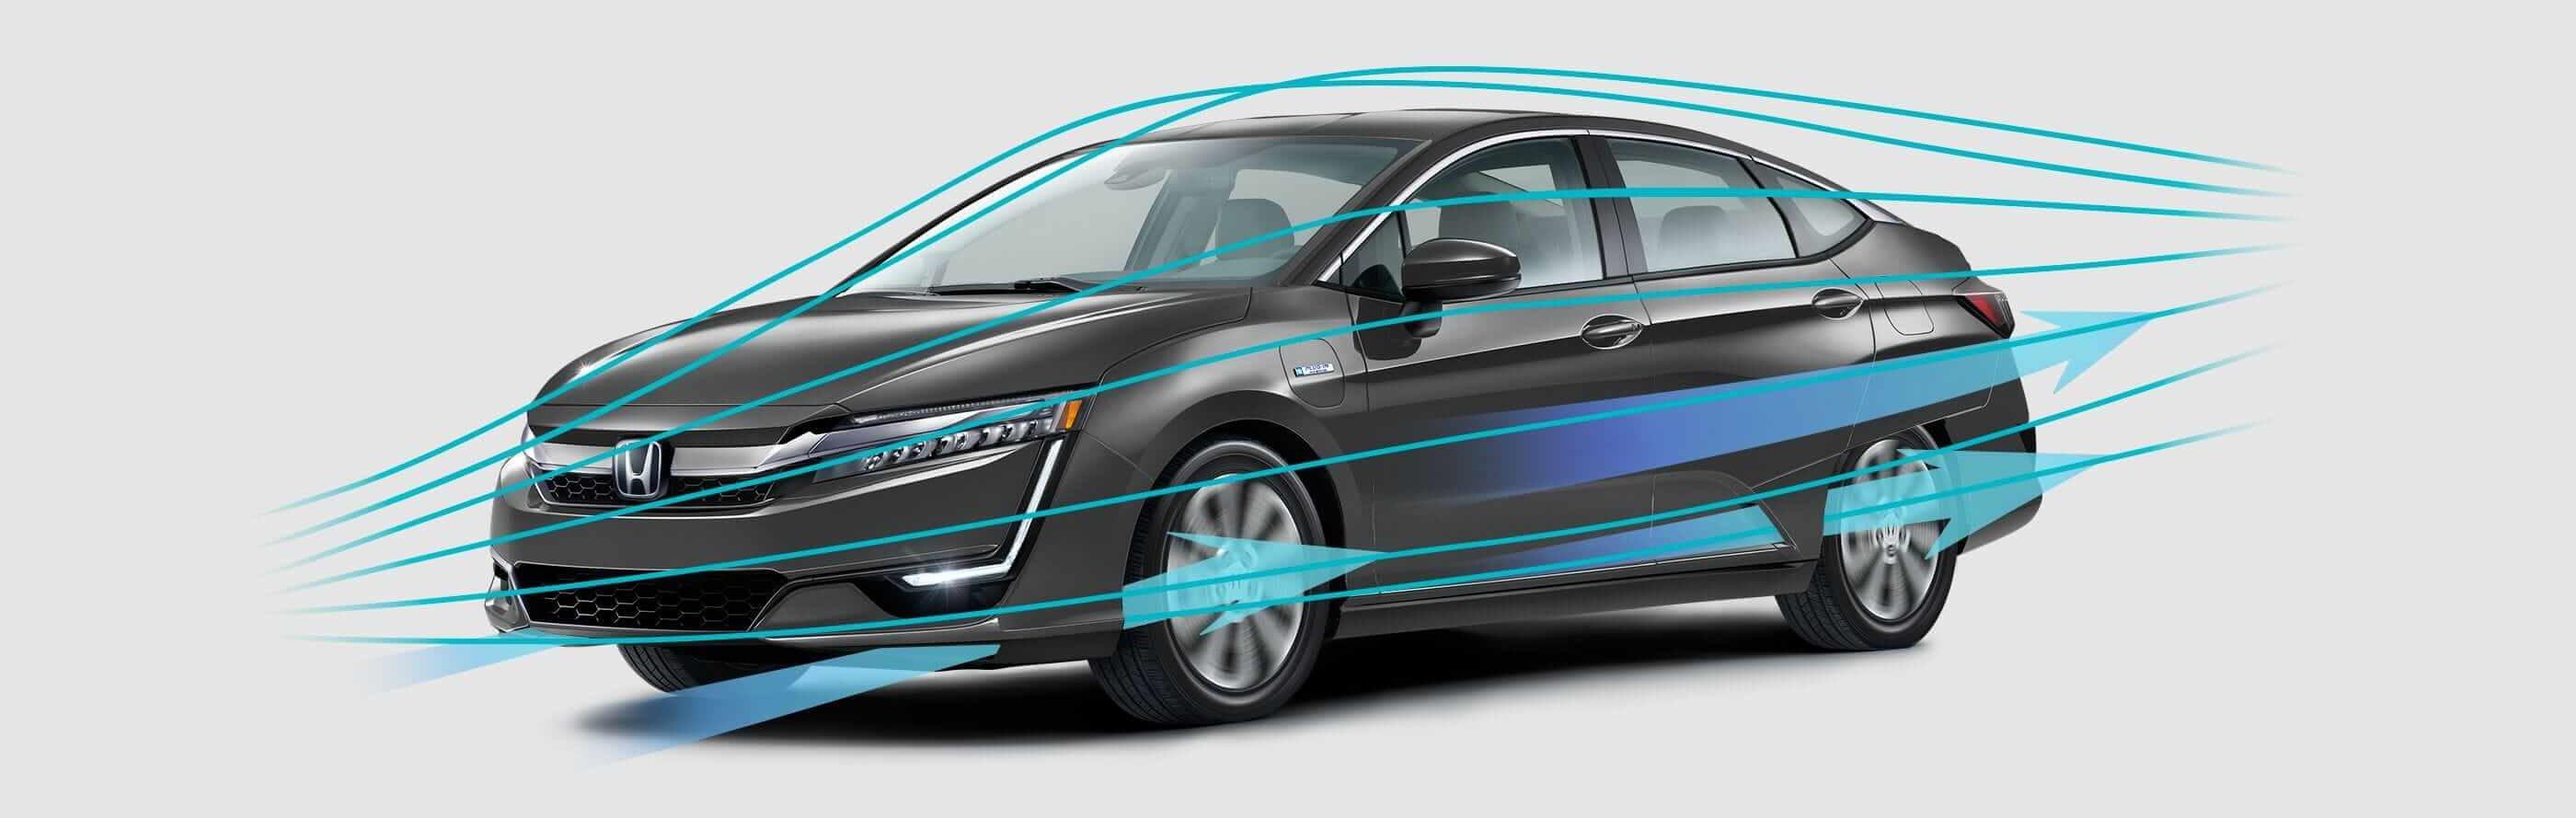 Célèbre 2018 Honda Clarity Plug-In Hybrid - Riverside Honda AT73